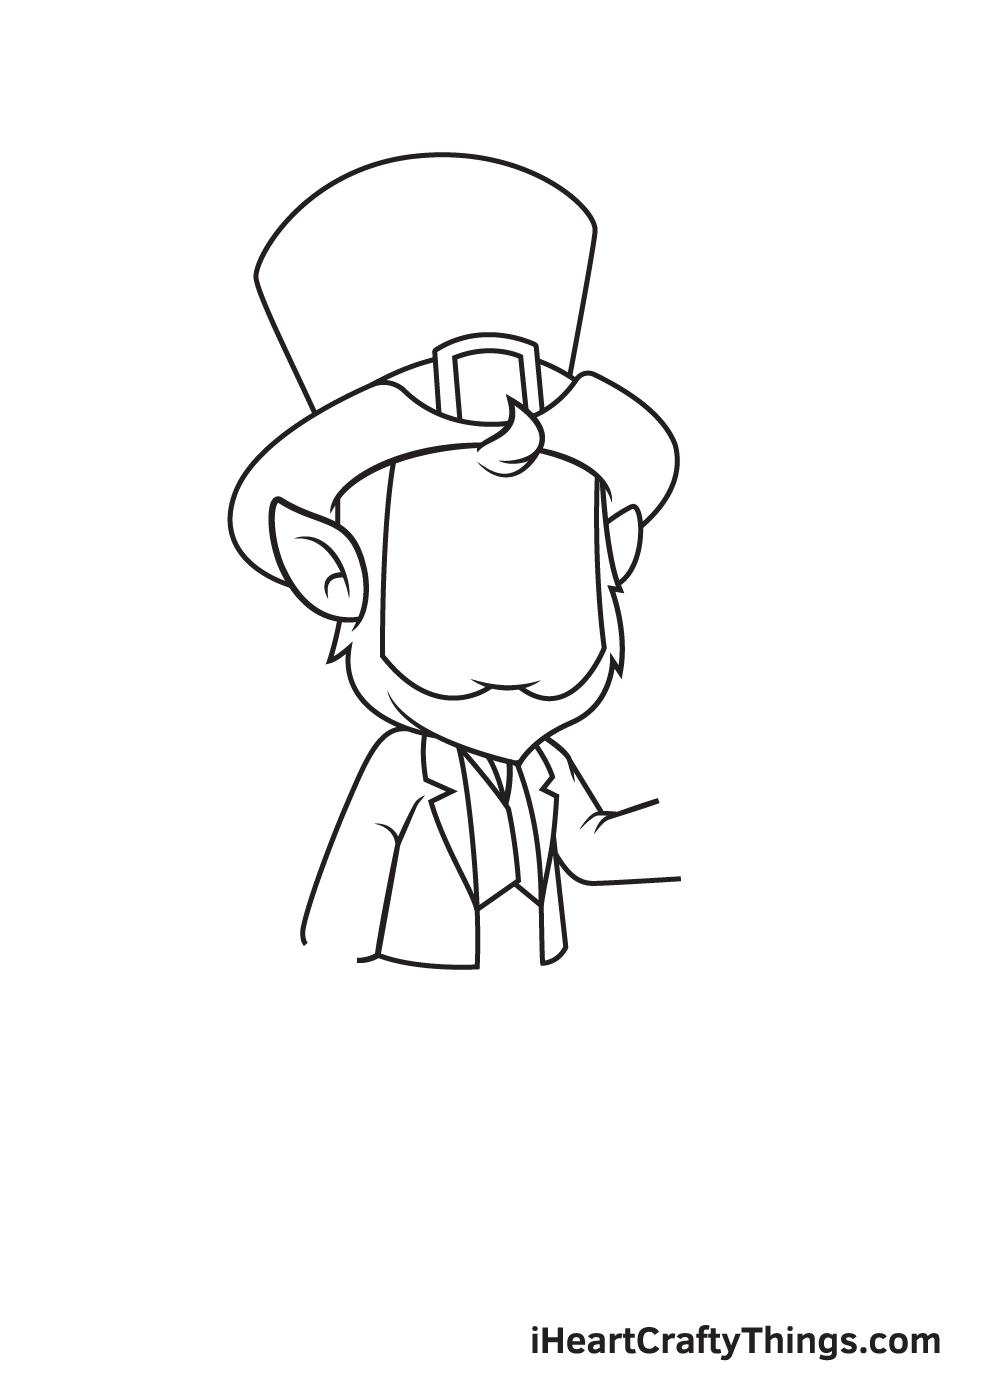 Leprechaun Drawing – Step 3